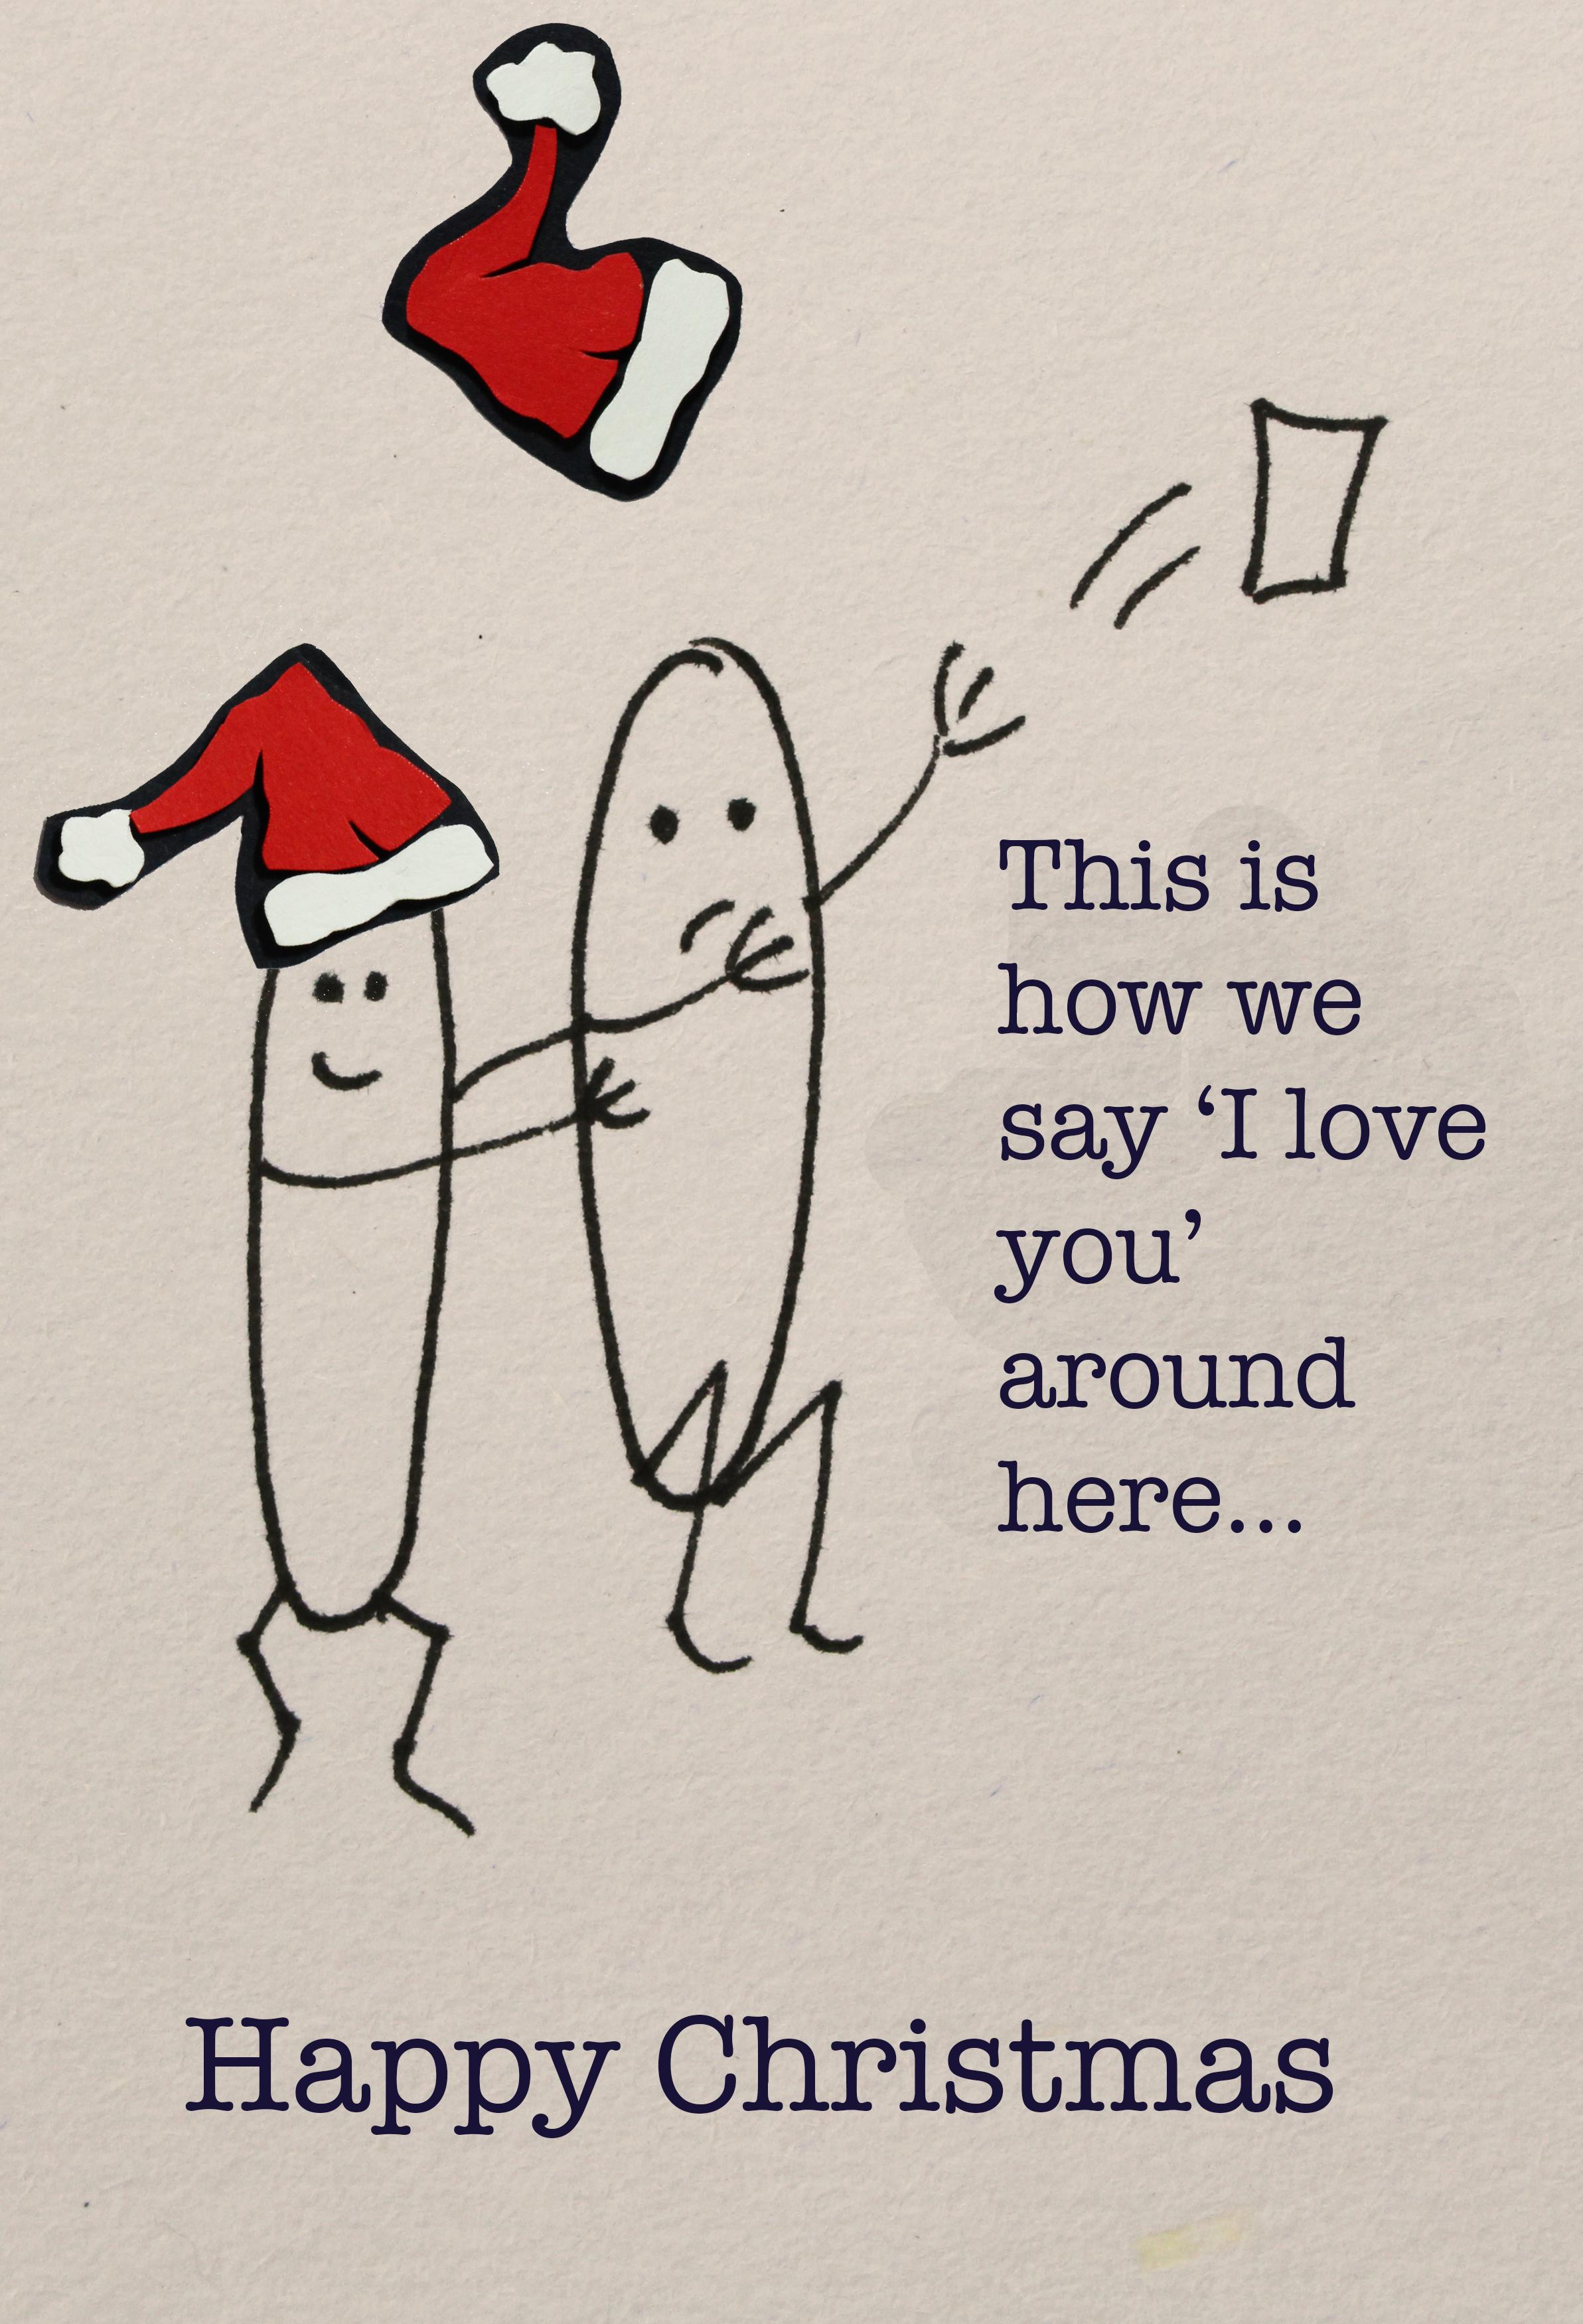 redbubble christmas card 2